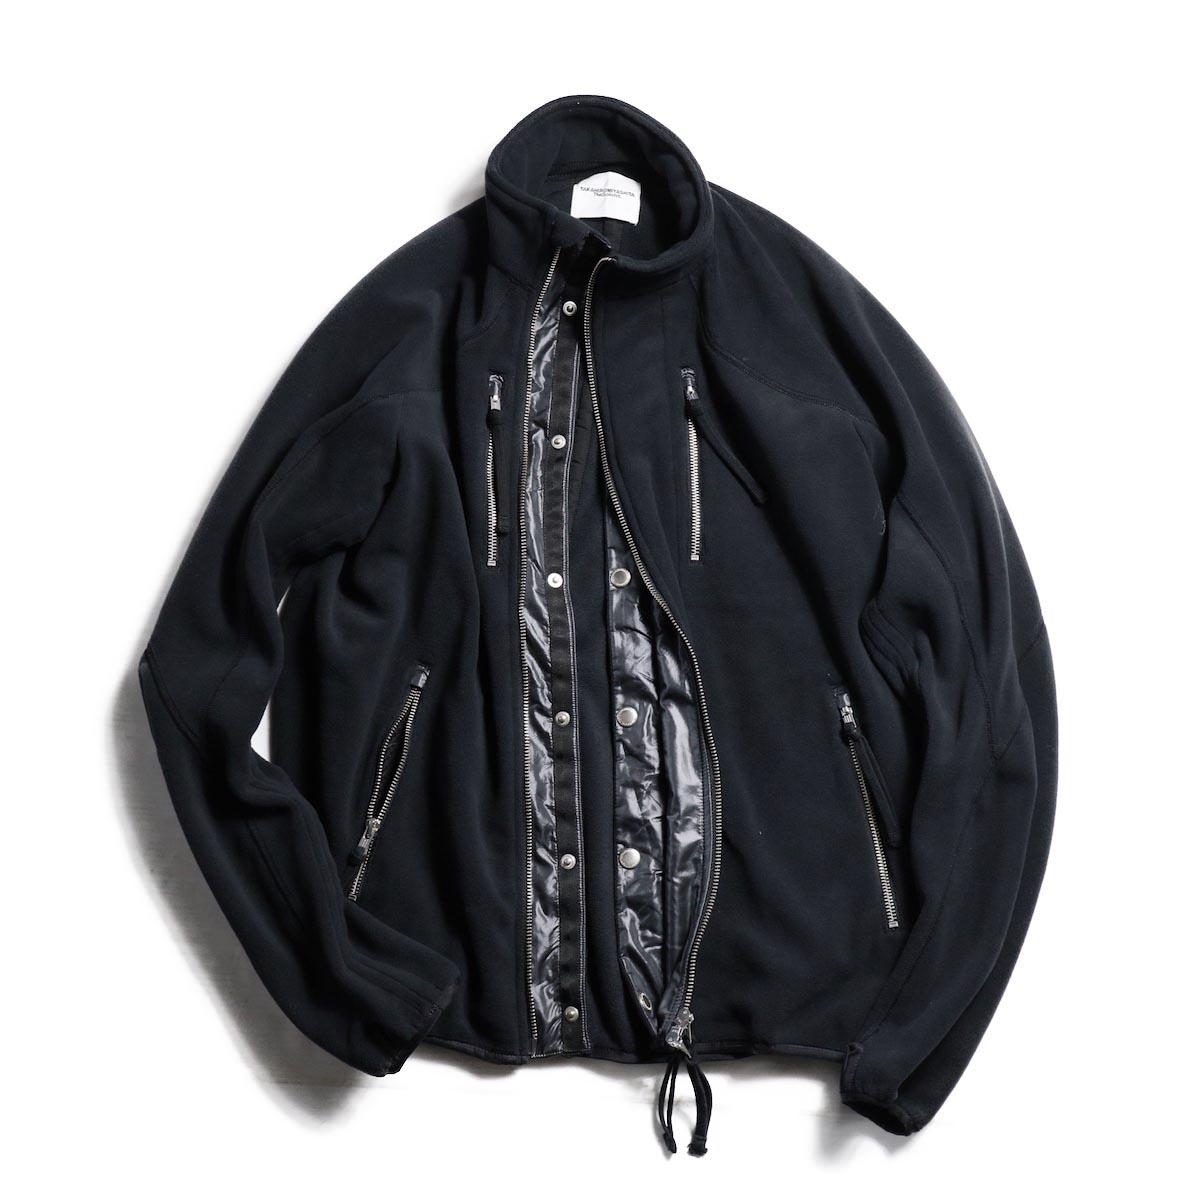 The Soloist / swj.0010AW18 regulator jacket.